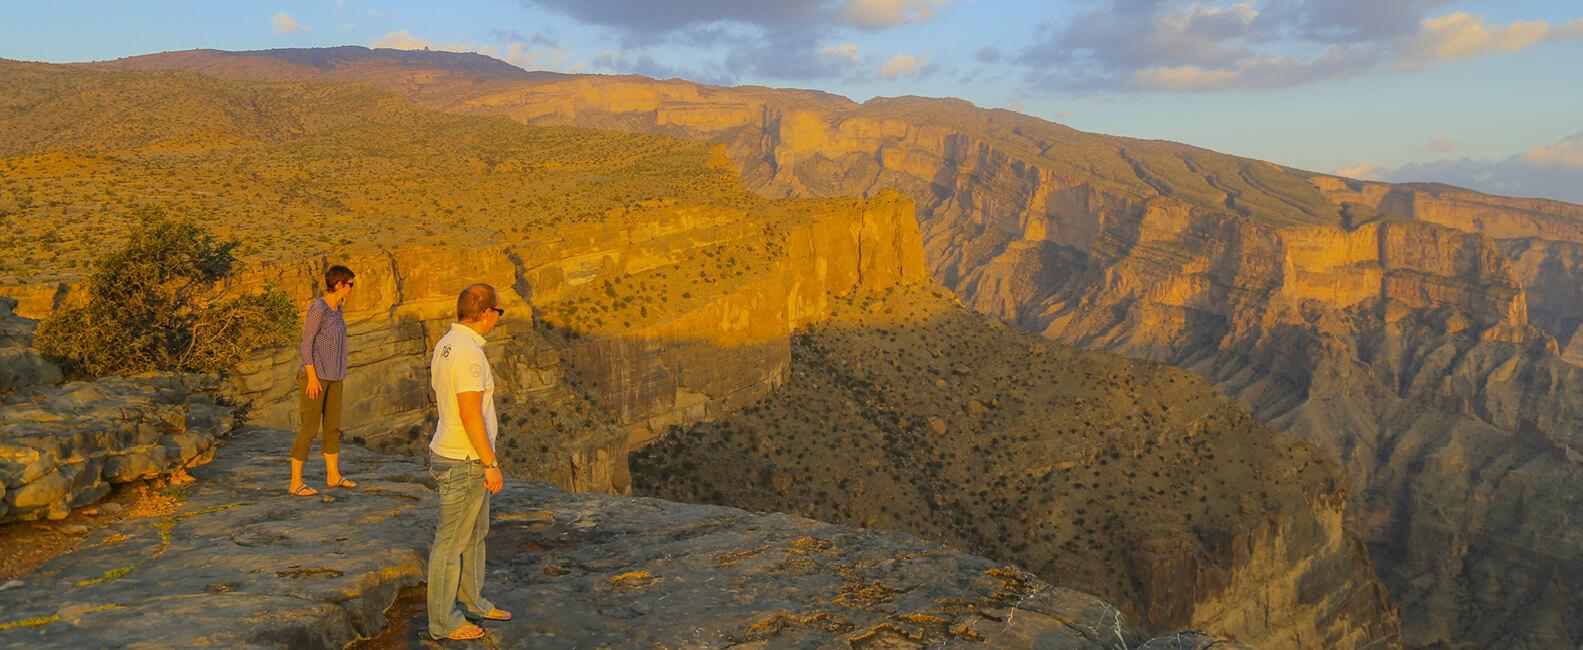 header-oman-rundfahrt-grand-canyon